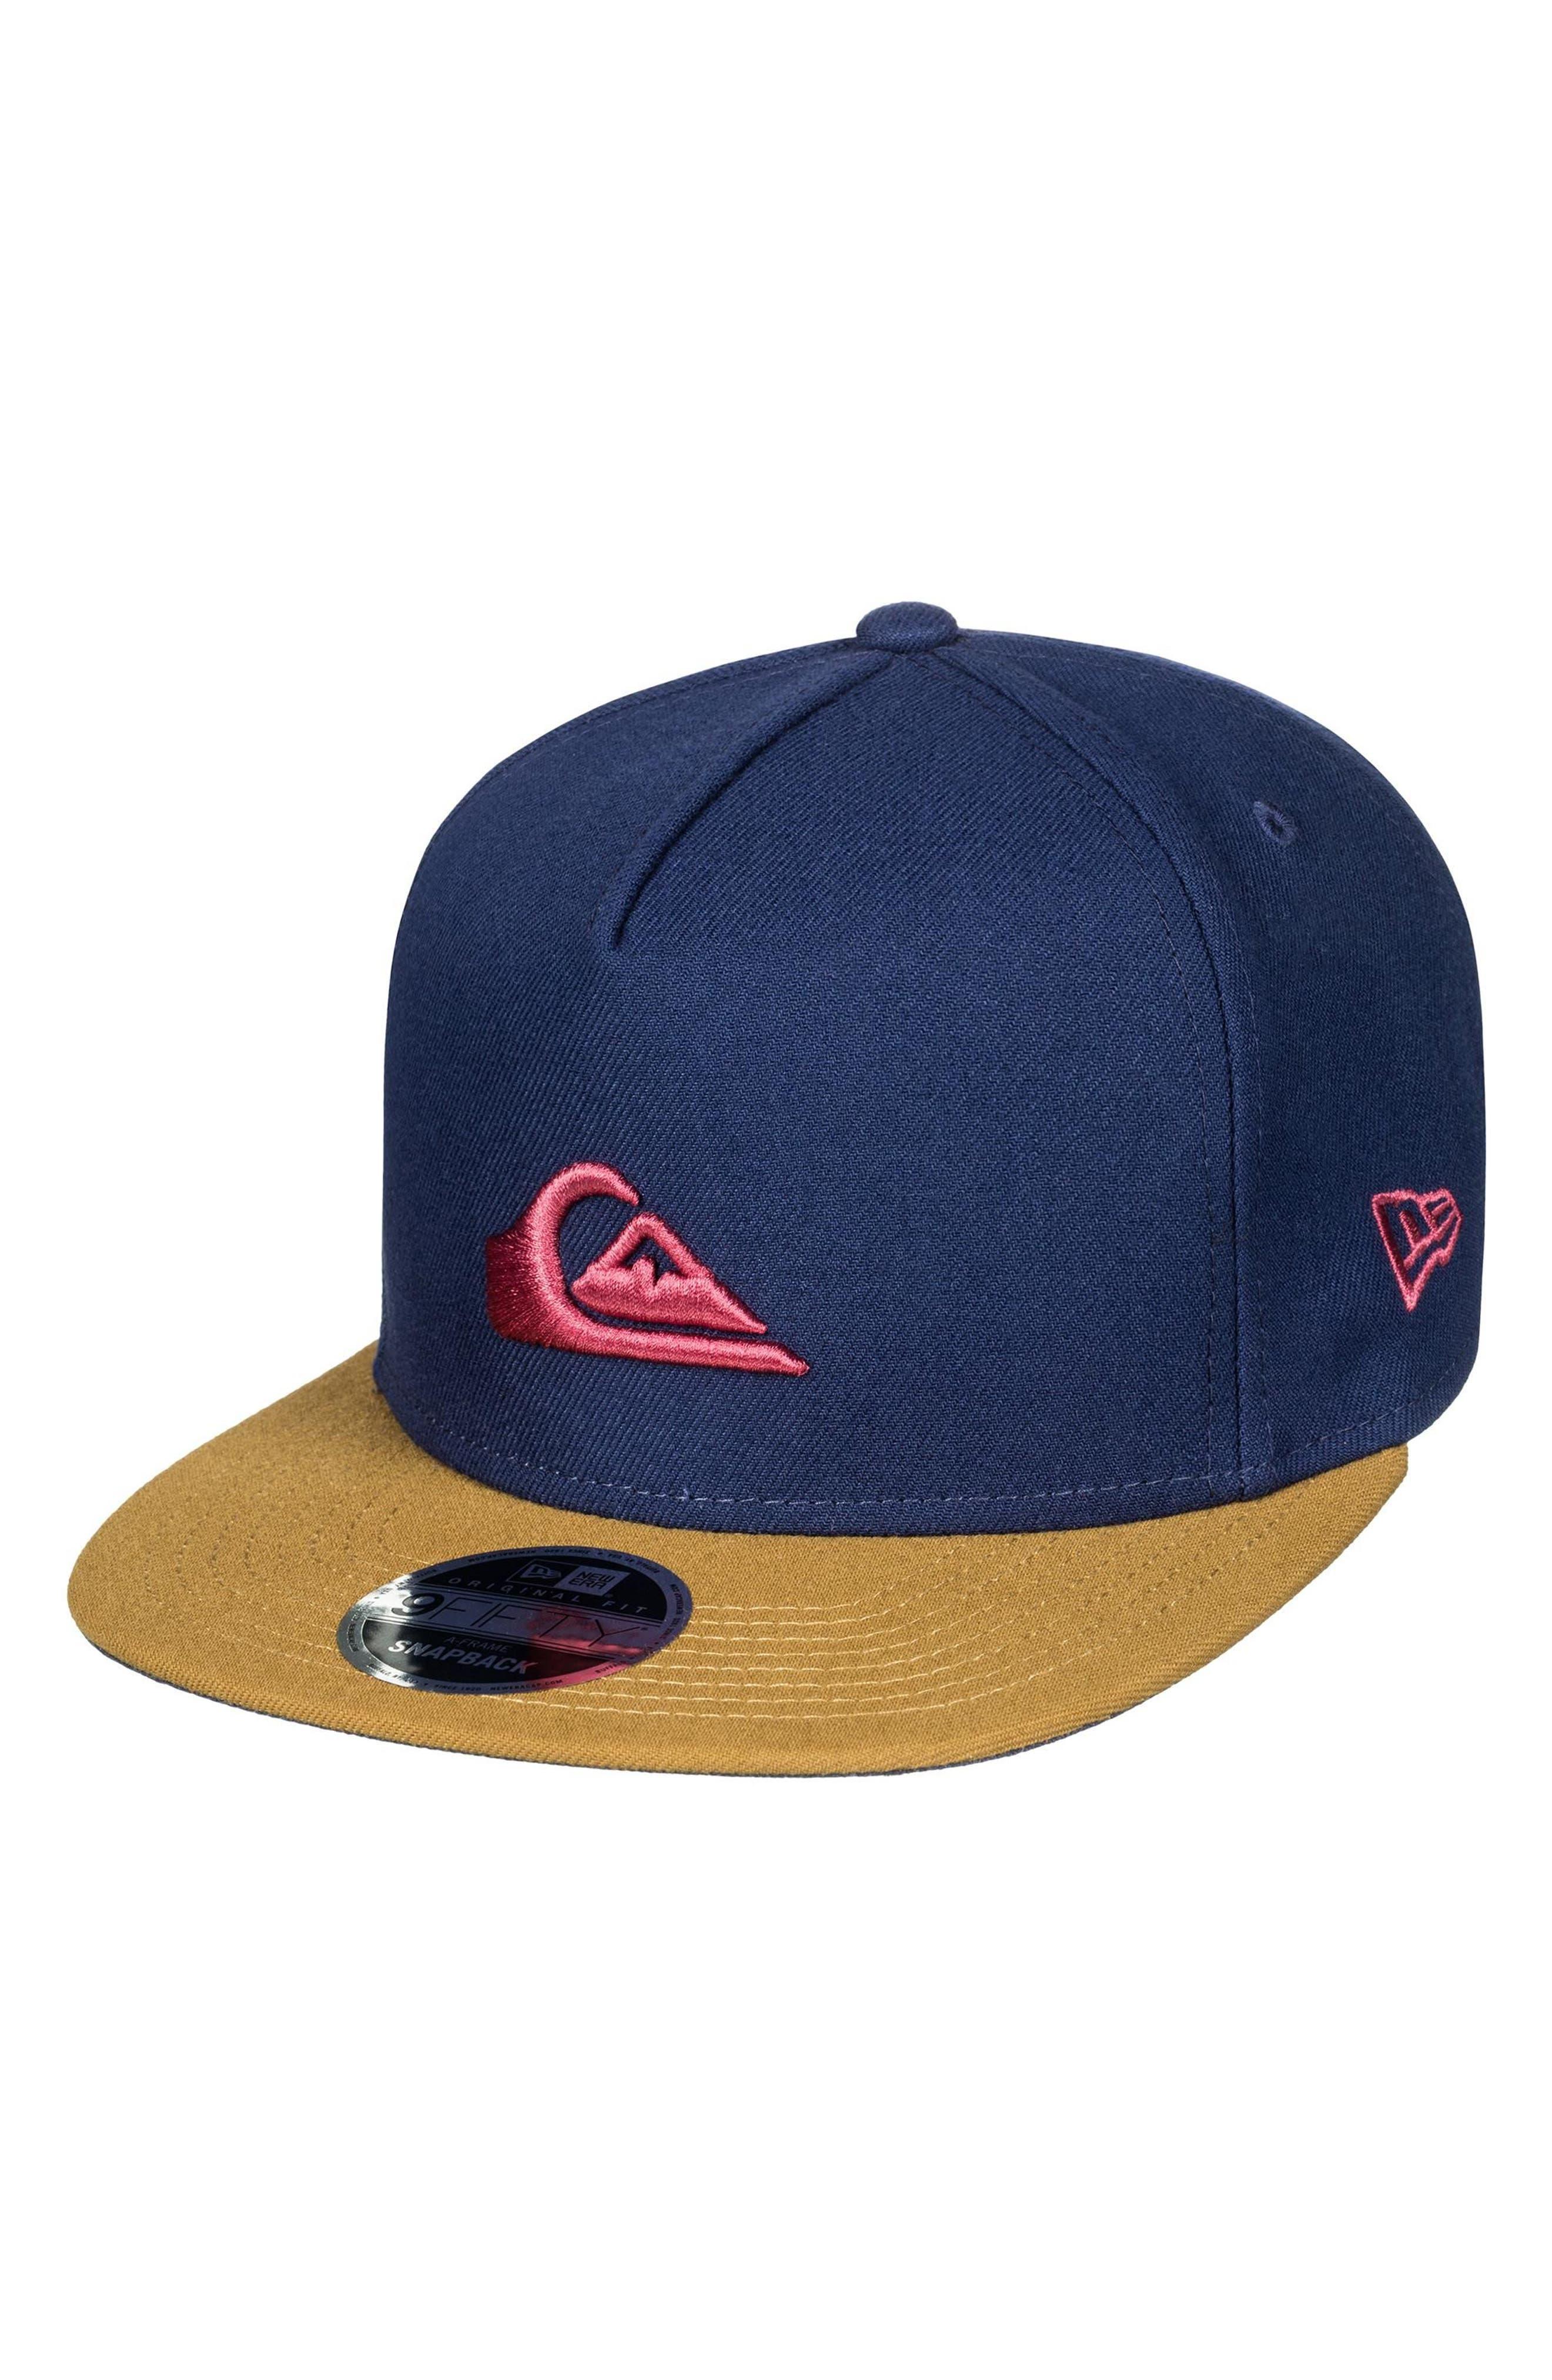 x New Era Stuckles Snapback Cap,                             Main thumbnail 1, color,                             Navy Blazer